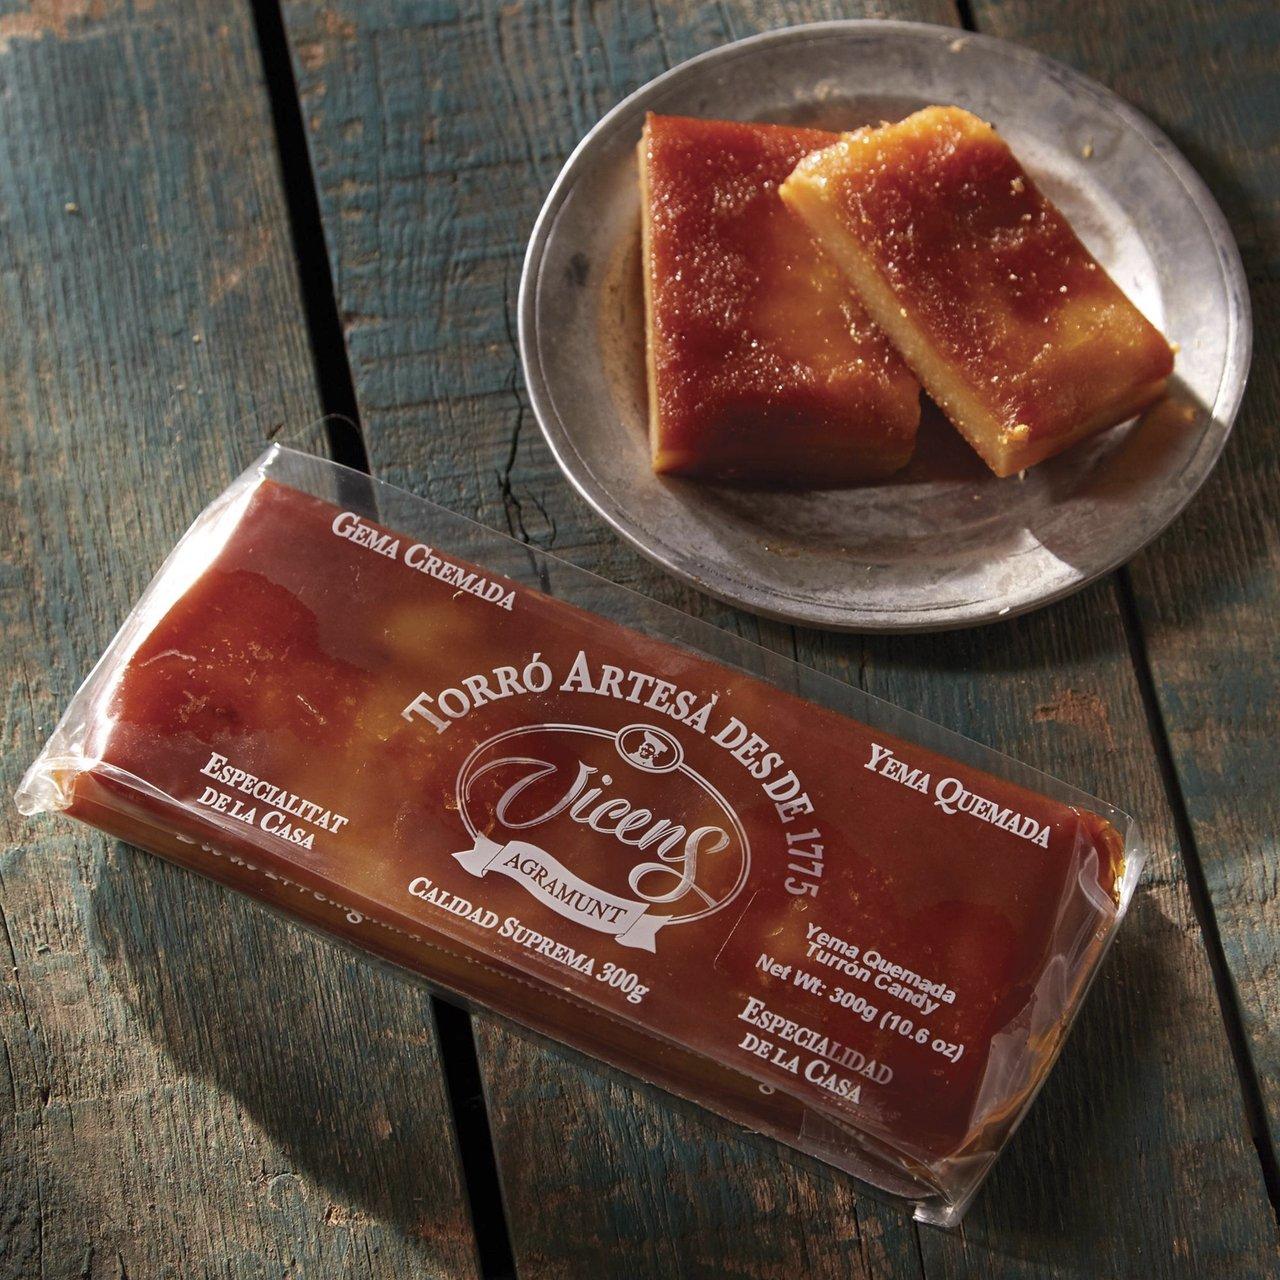 Amazon.com : Yema Quemada (Crème Brûlée) Turrón by Vicens : Grocery & Gourmet Food